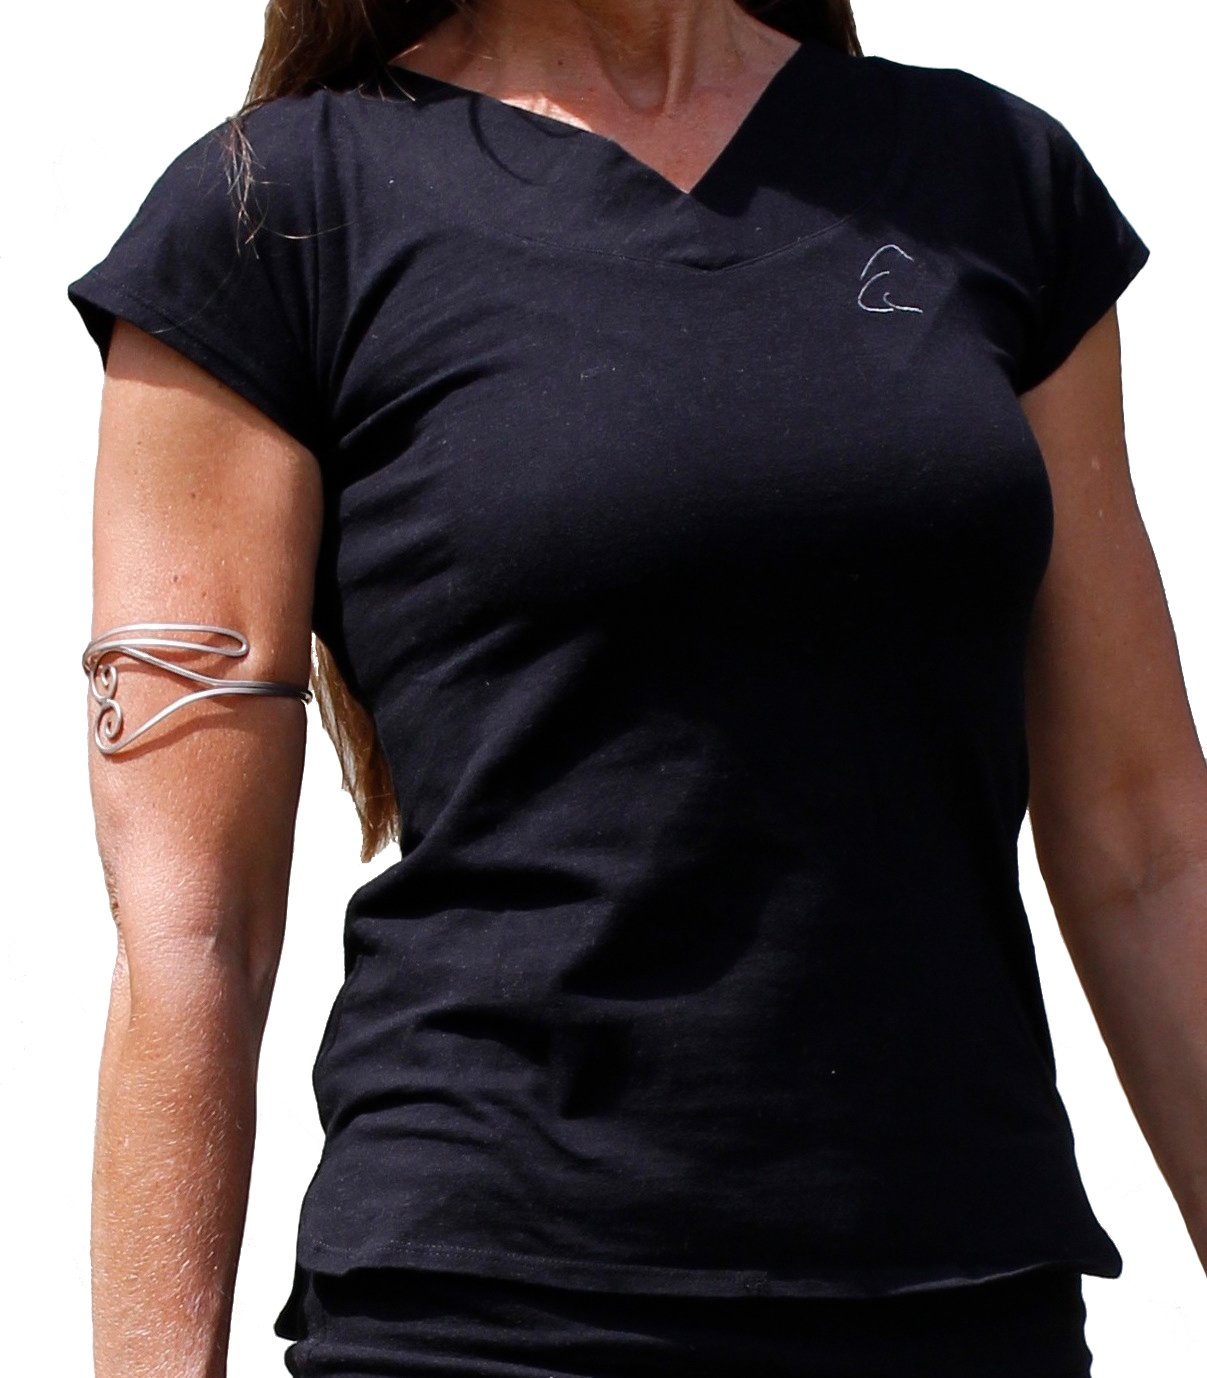 /Camiseta con Cuello de V Farishta en algod/ón org/ánico, Color Schneeweiss, tama/ño Medium Esparto /¨ Farishta/